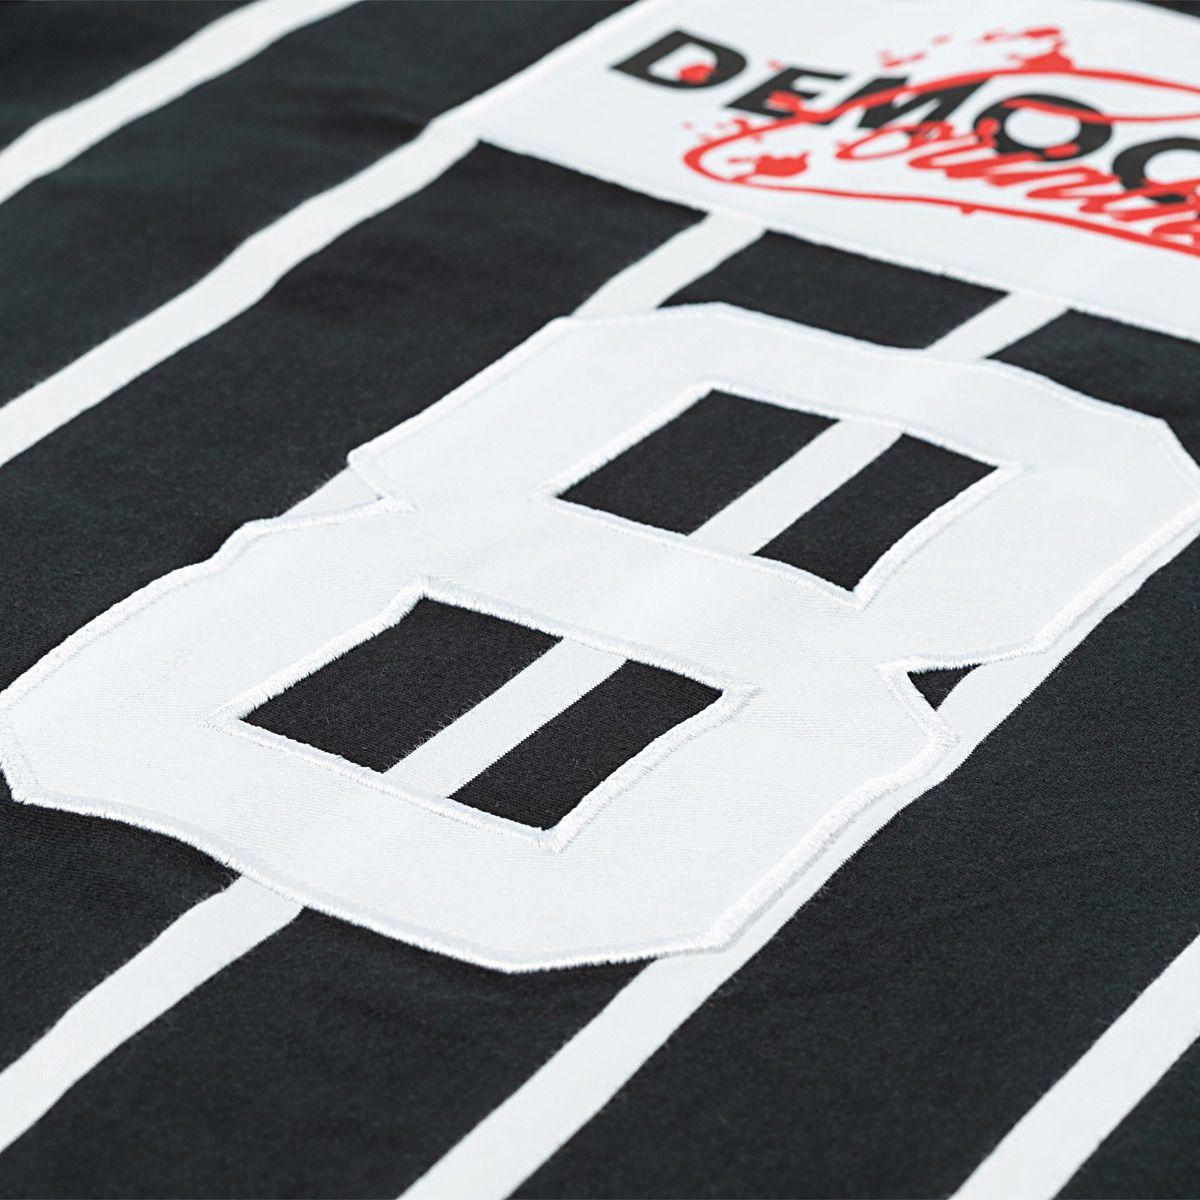 Camiseta Retrô Corinthians 1982 Sócrates Masculina